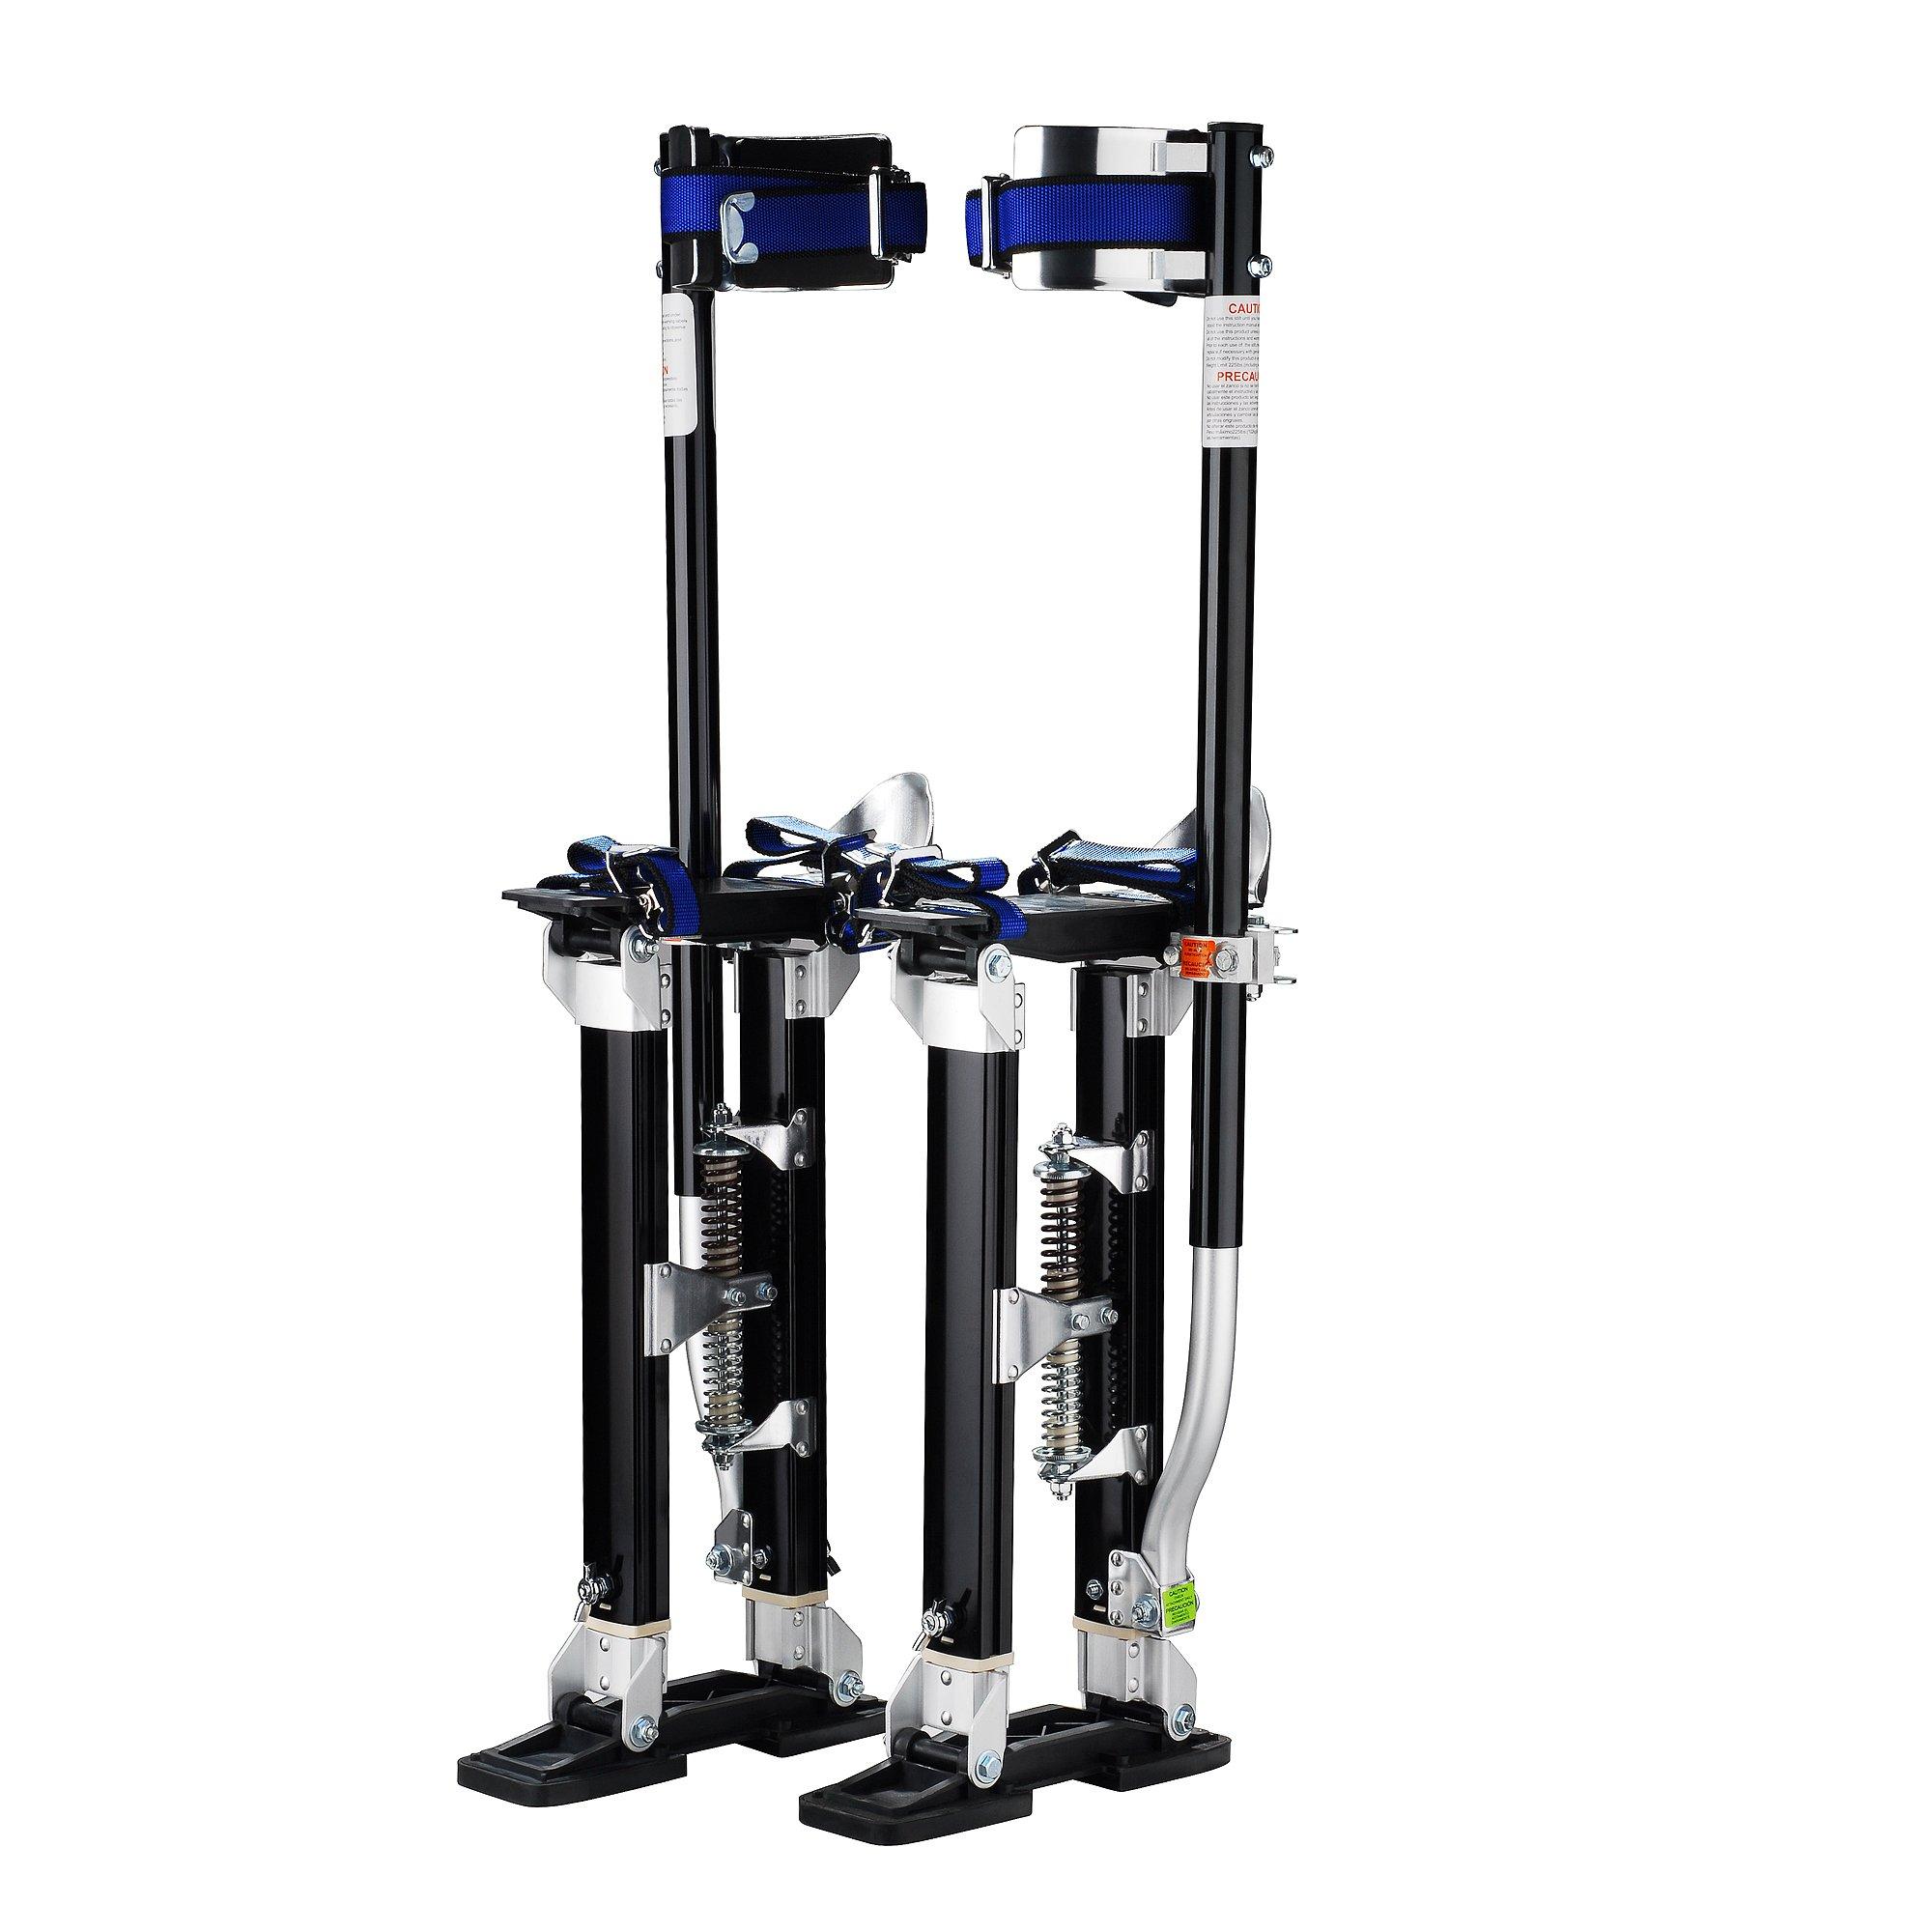 Pentagon Tools 1116 Black Drywall Stilt 18-30 Pentagon Tool Professional 18''-30'' Black Drywall Stilts Highest Quality